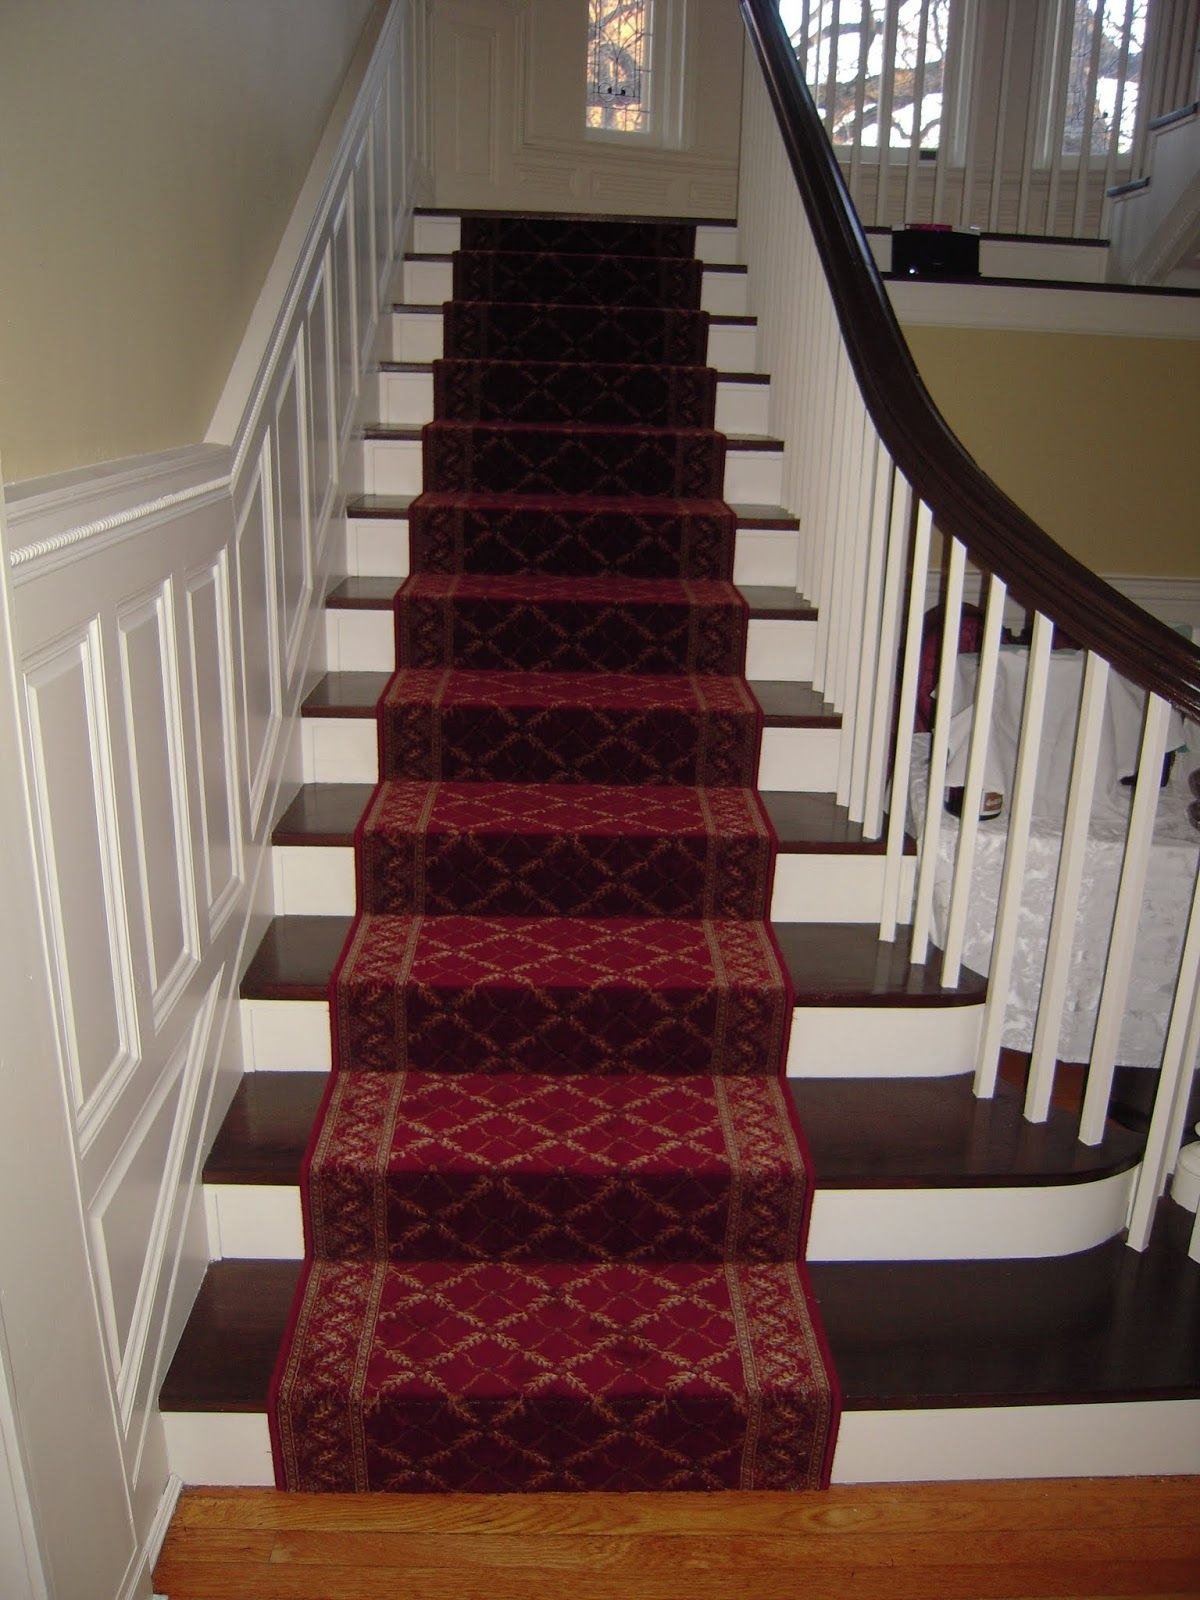 Flooring Pretty Stair Treads Carpet For Stair Decoration Idea Regarding Oriental Carpet Stair Treads (#6 of 20)